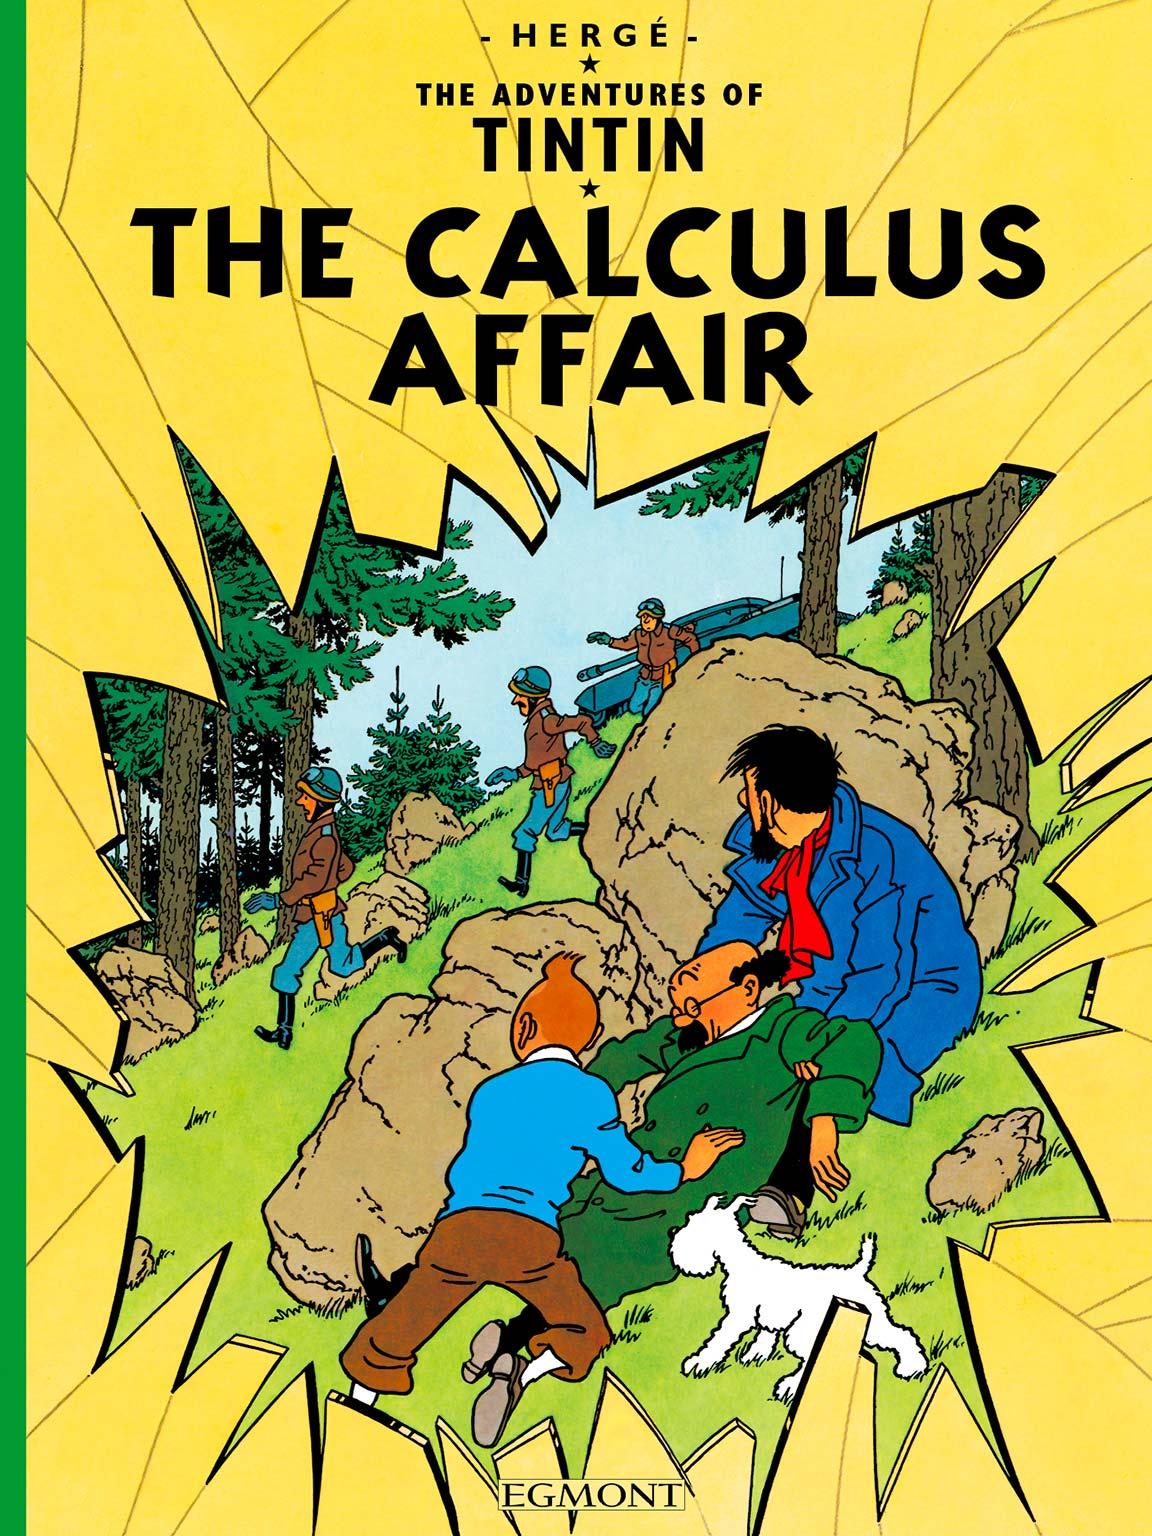 The Calculus Affair - Cover